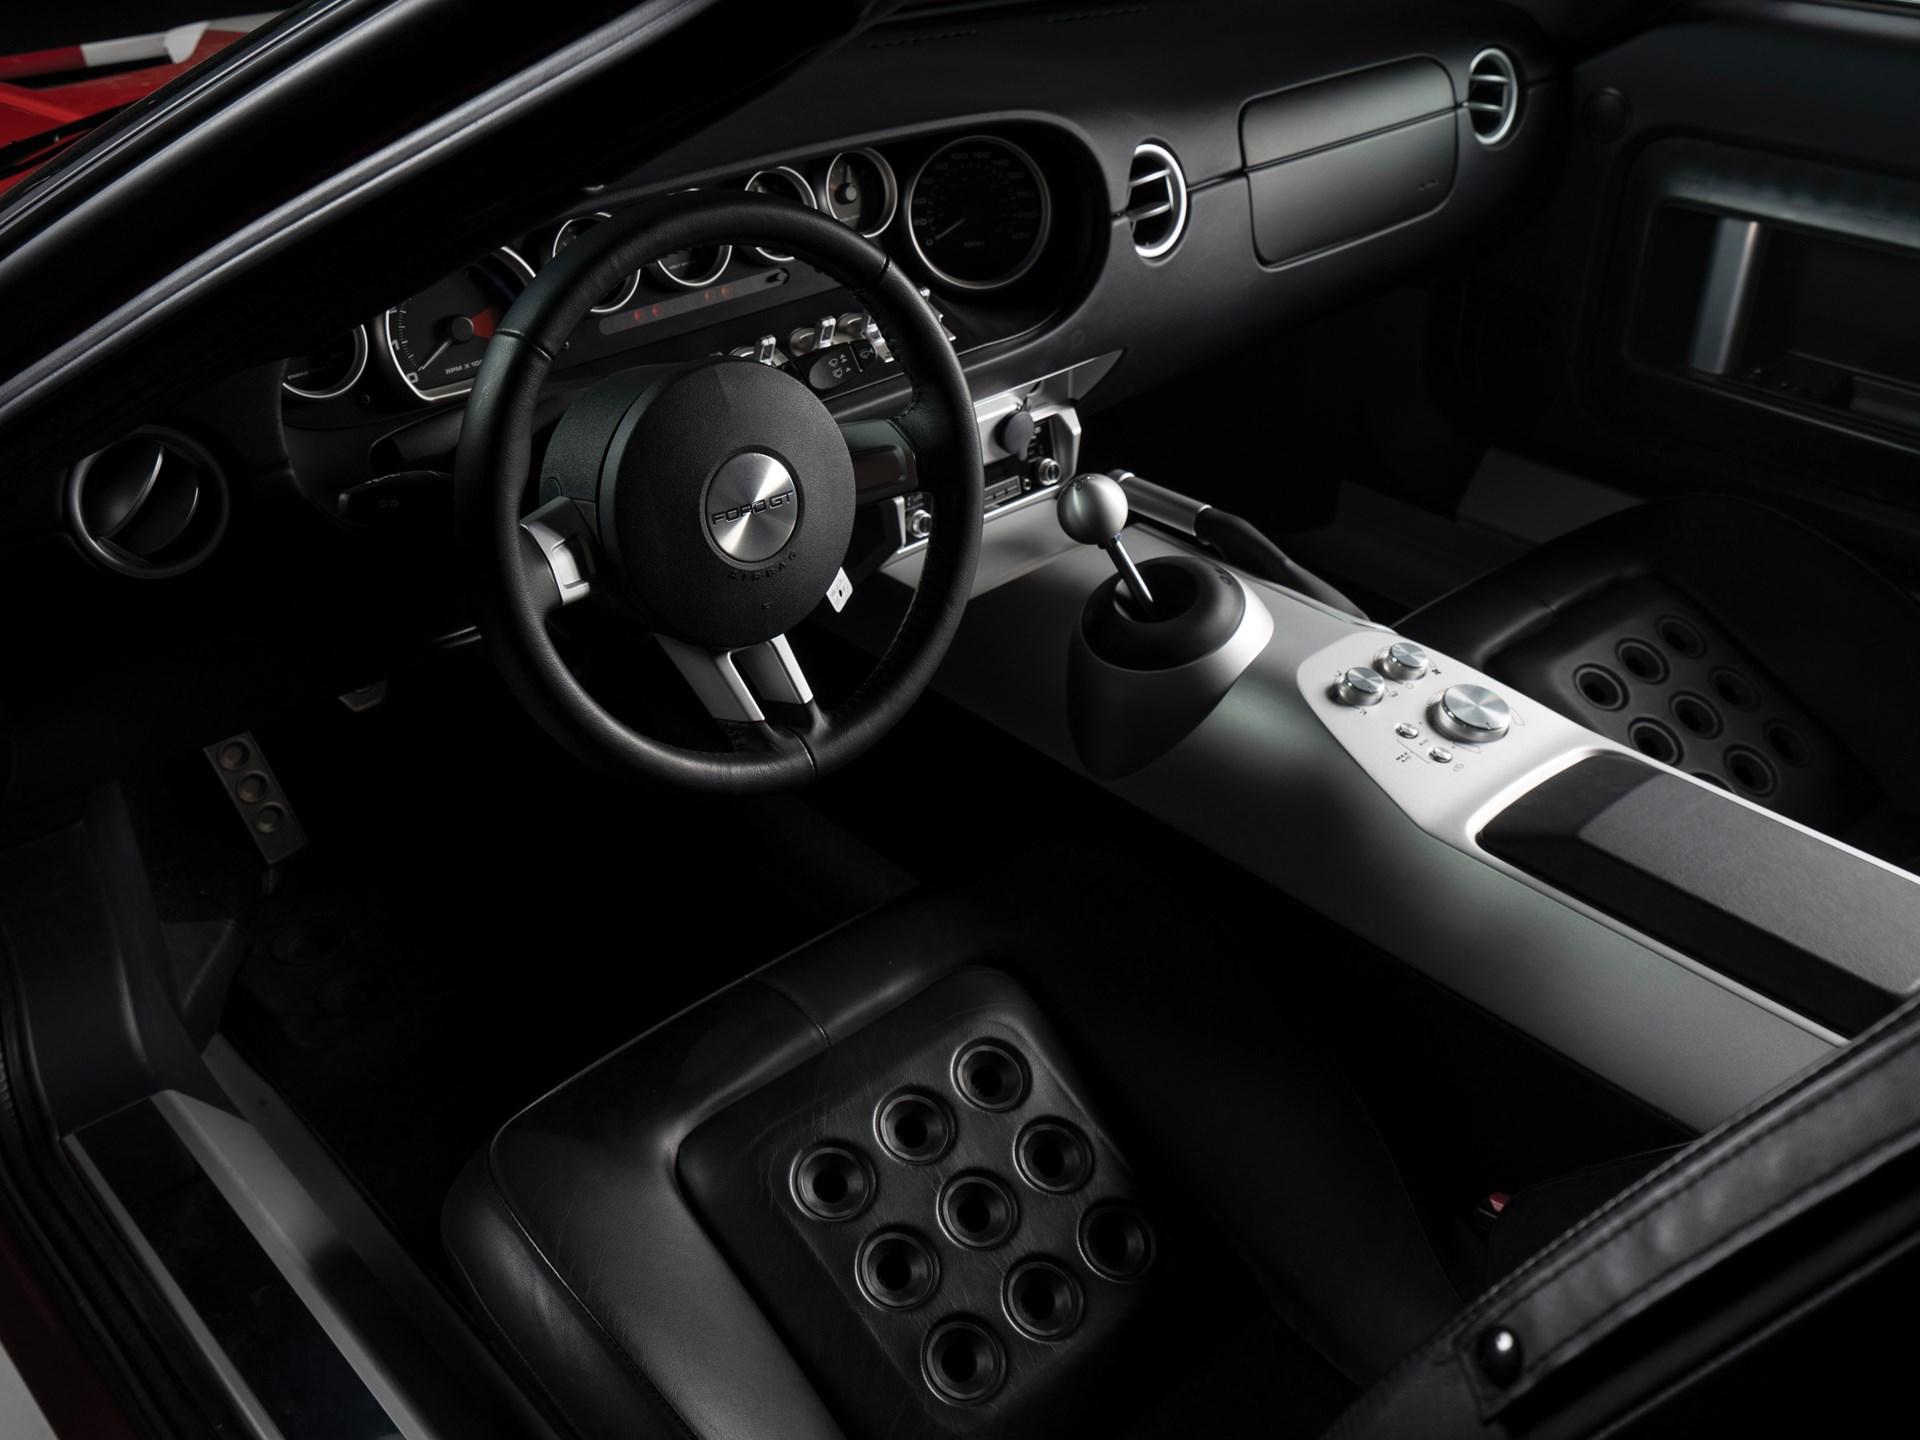 2005 Ford GT Interior